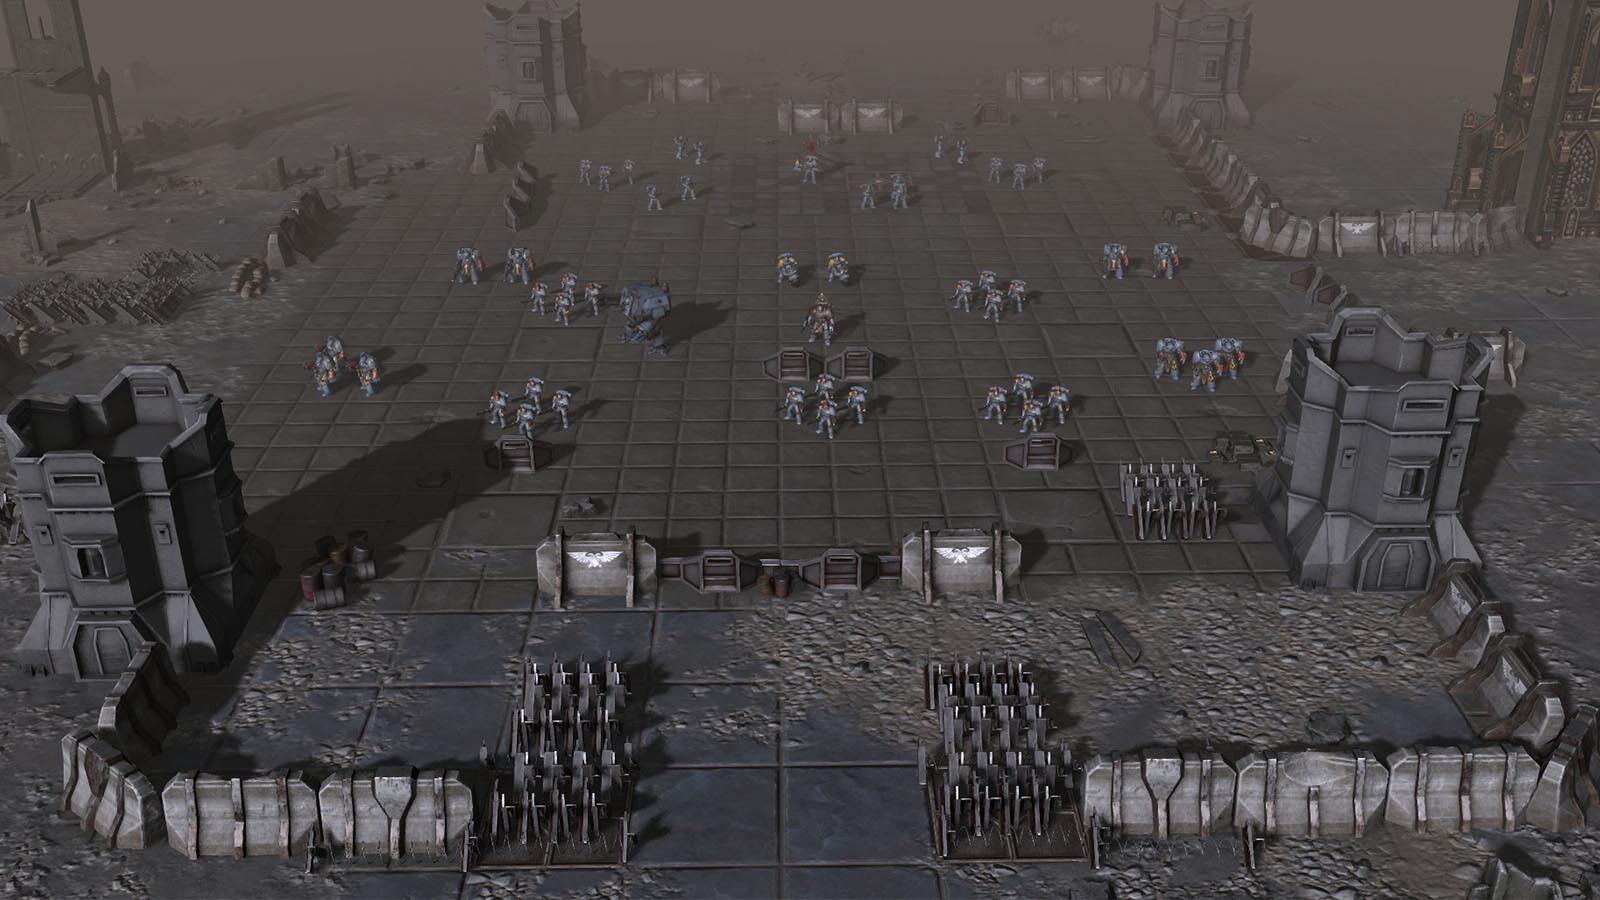 Warhammer 40,000: Sanctus Reach [Steam CD Key] for PC - Buy now